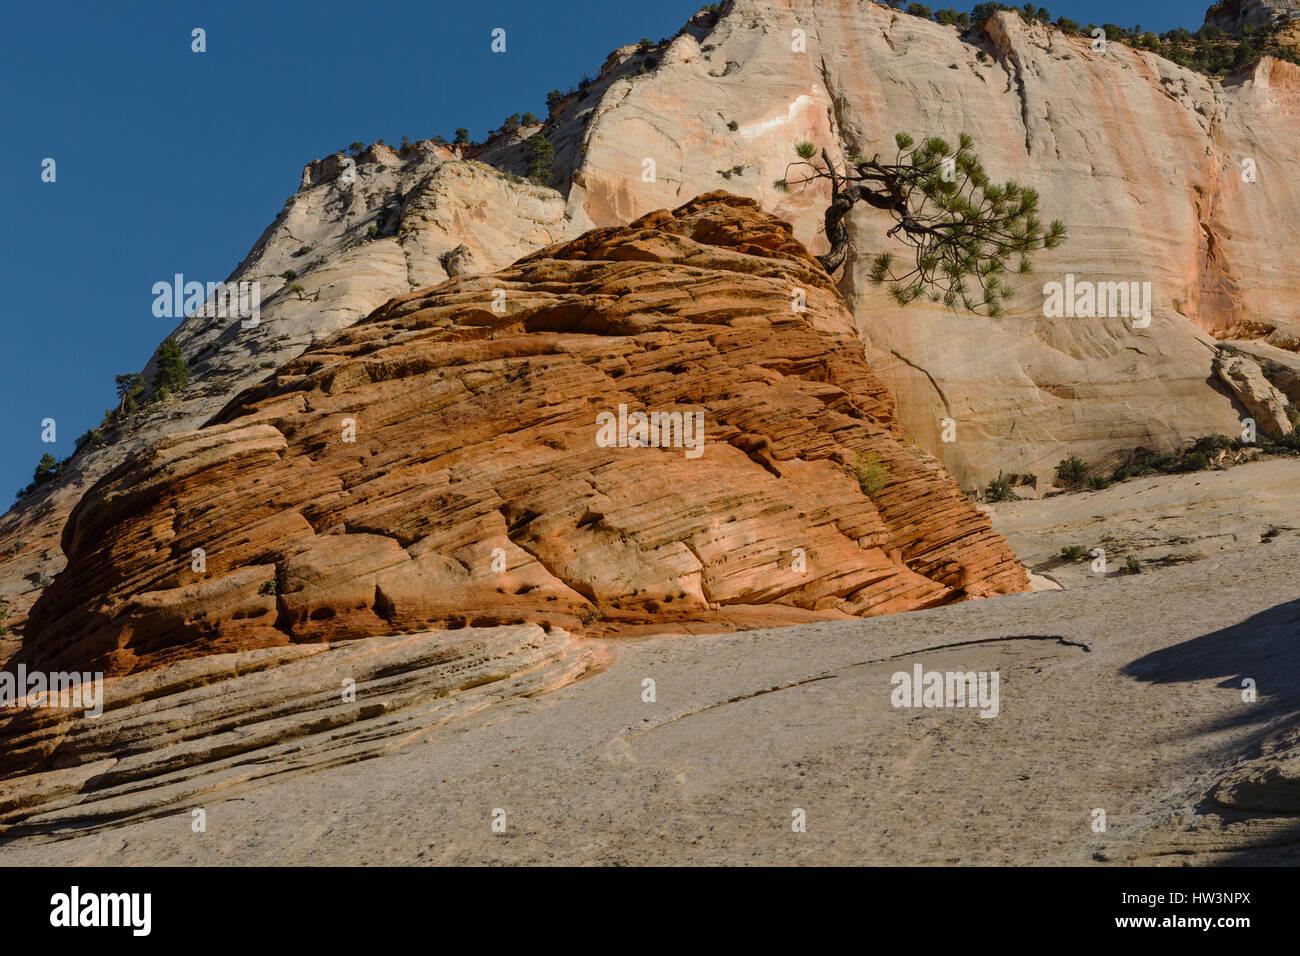 Piñon Pine (Pinus edulis) growing on rock formation, Zion National Park, UT, USA - Stock Image